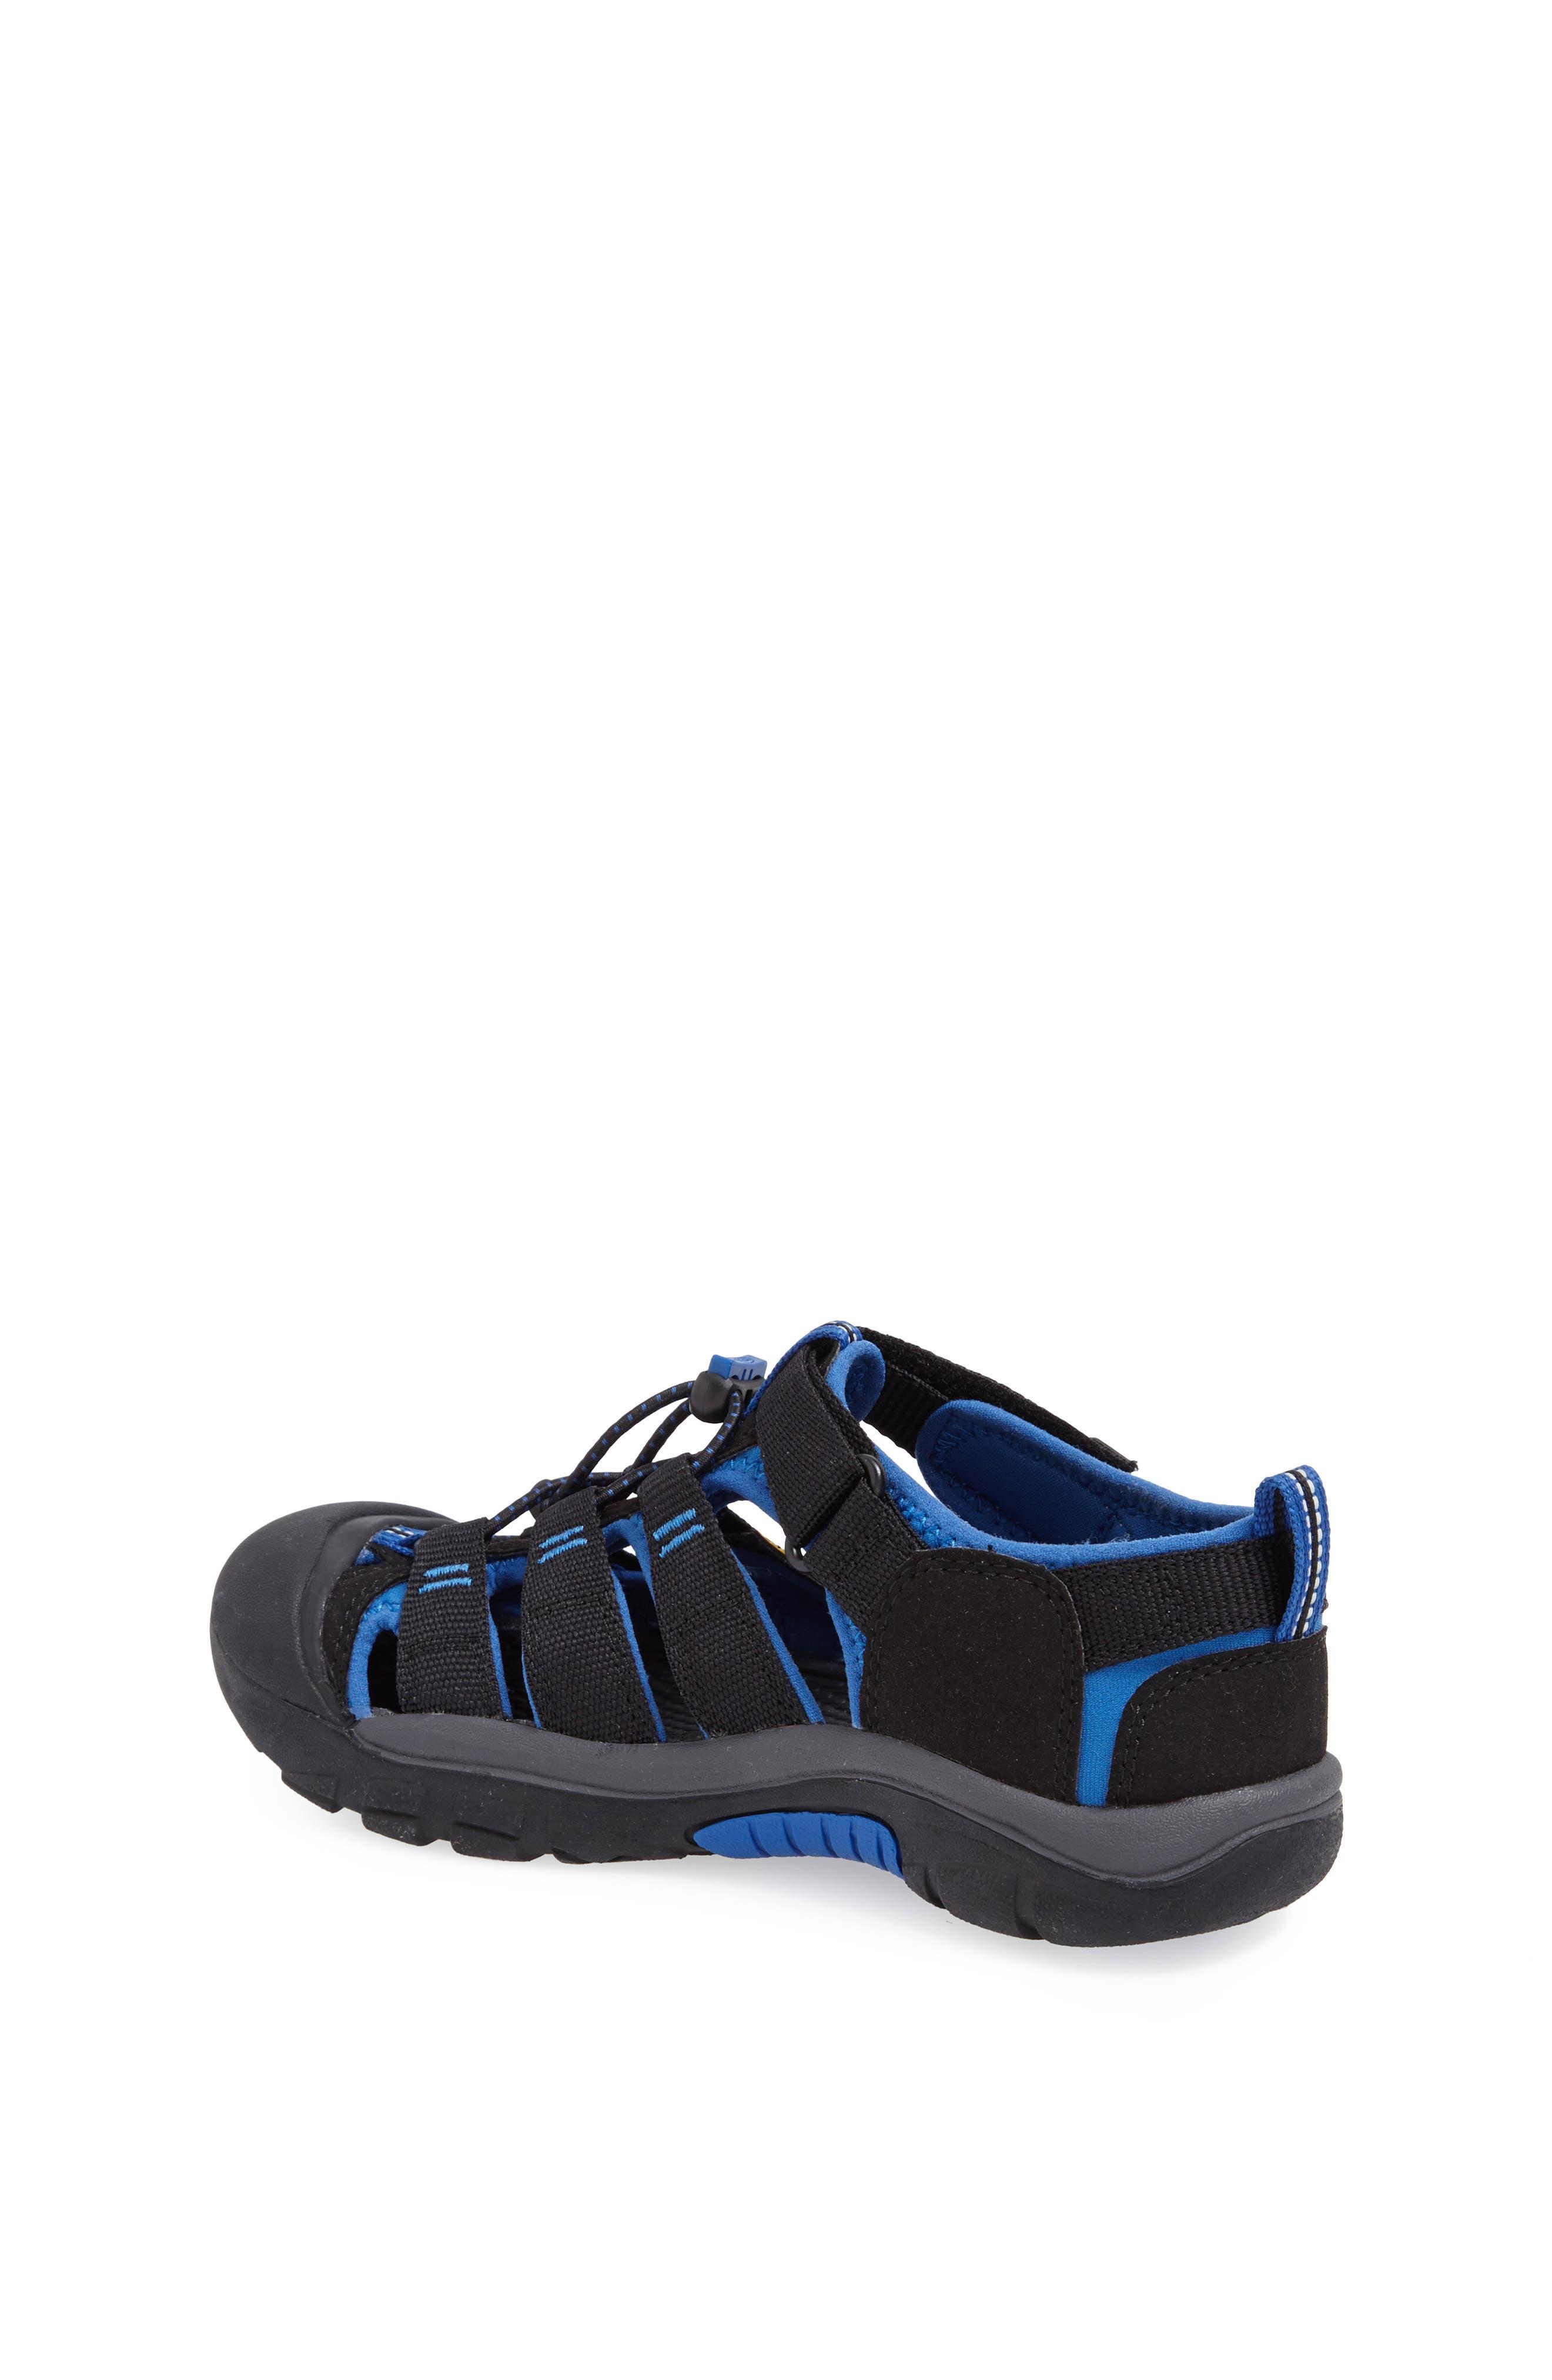 'Newport H2' Water Friendly Sandal,                             Alternate thumbnail 72, color,